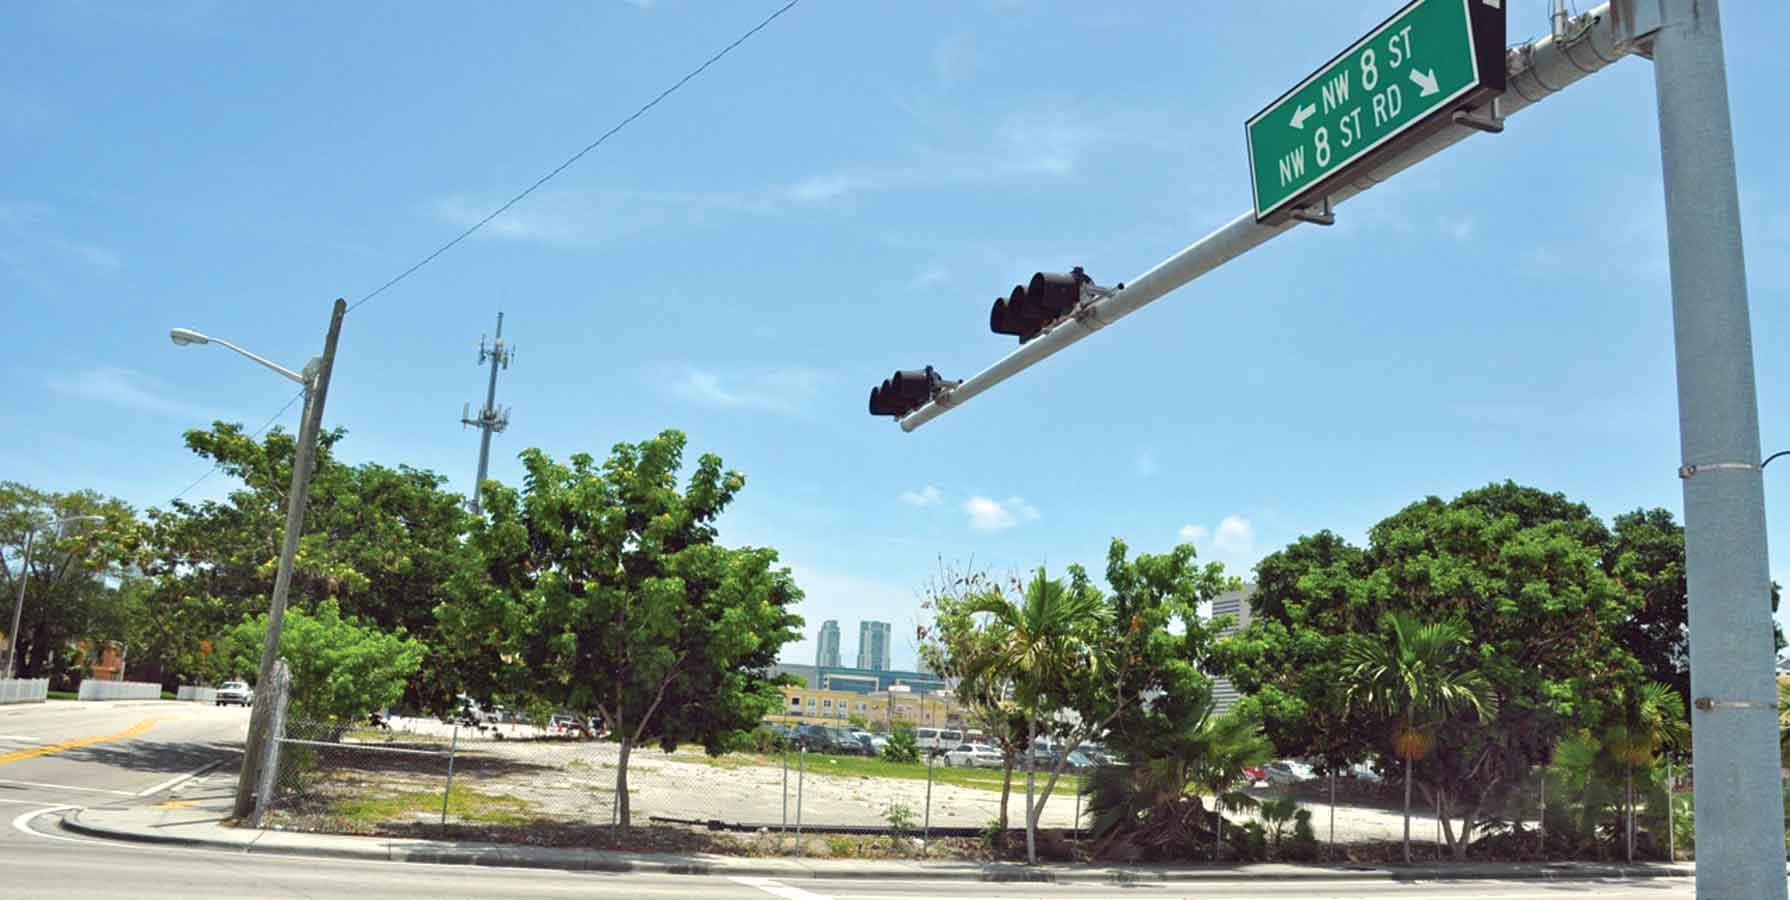 633 rental units near Miami River advance